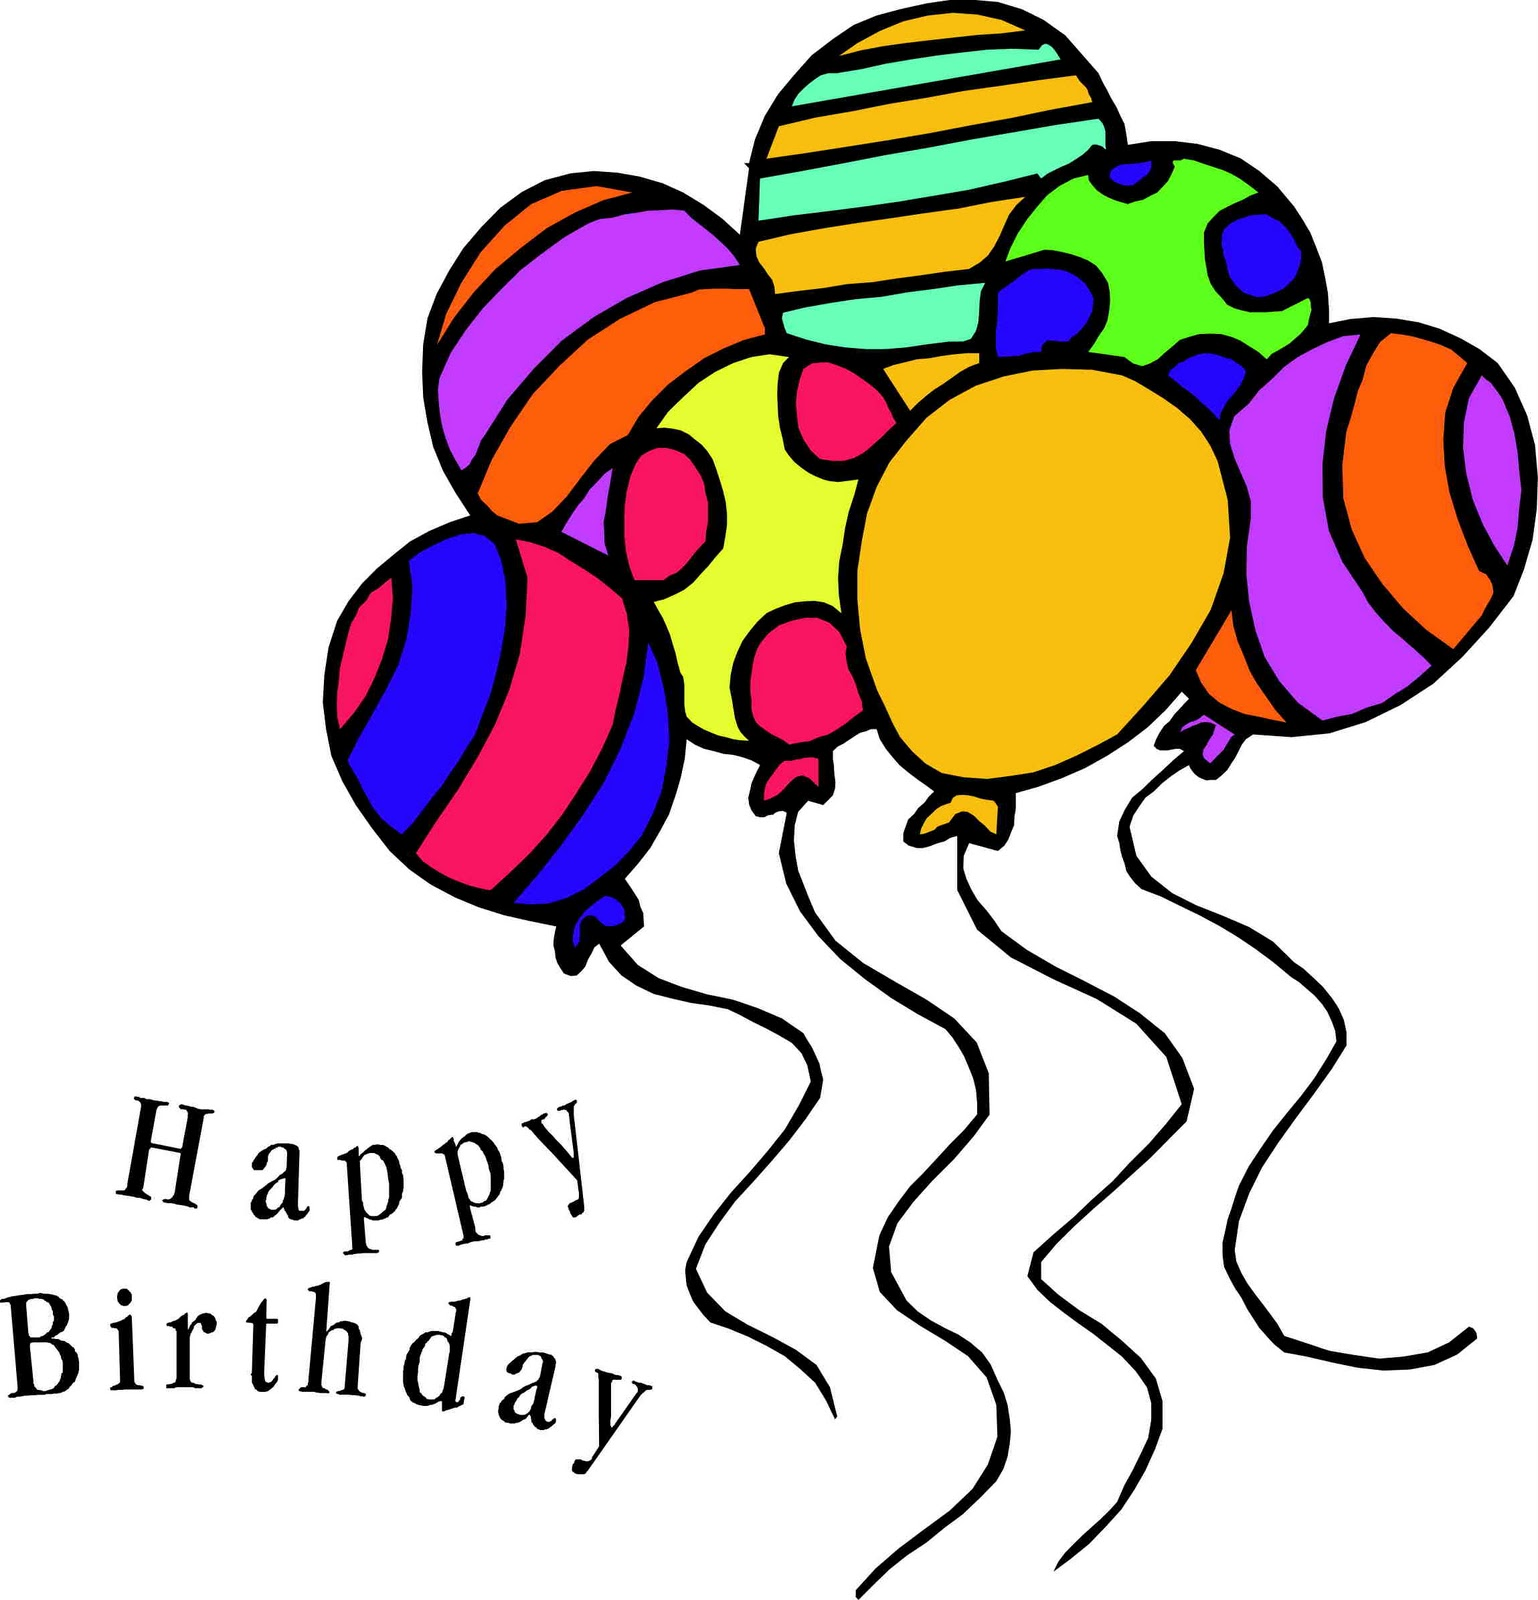 1538x1600 Sensational Happy Birthday Clipart Animated Free Clip Art Image